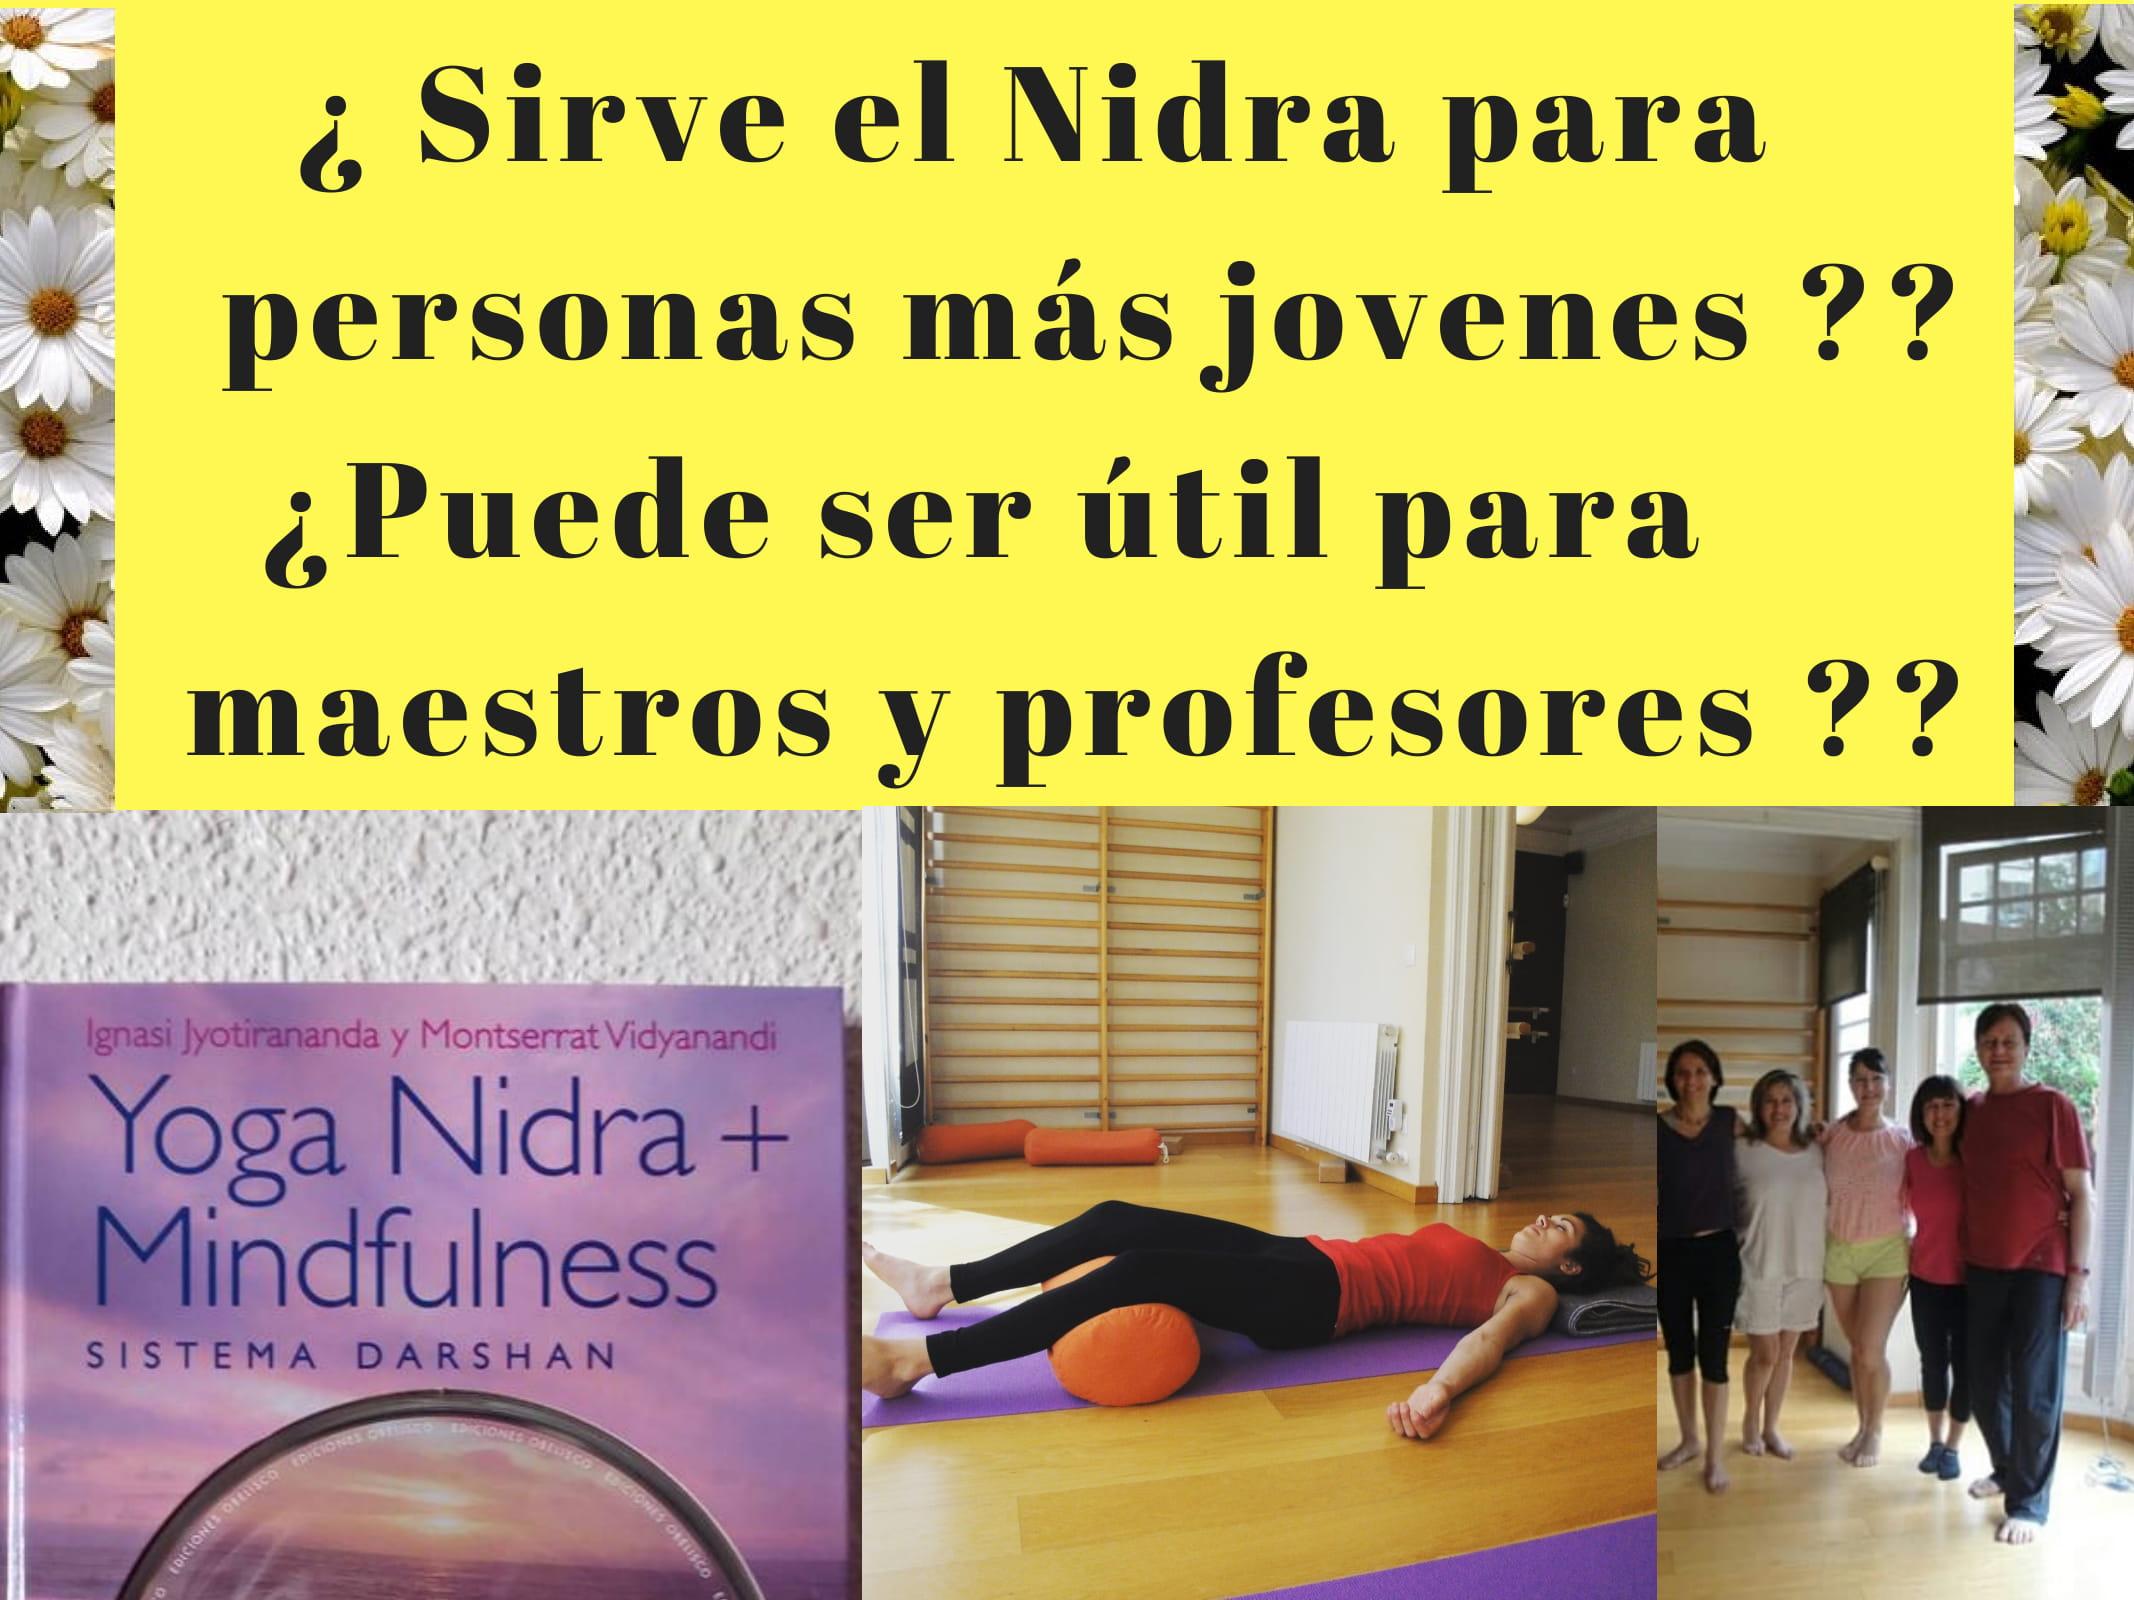 PROFESORES Curso Intensivo Verano Yoga Nidra Mindfulness-1